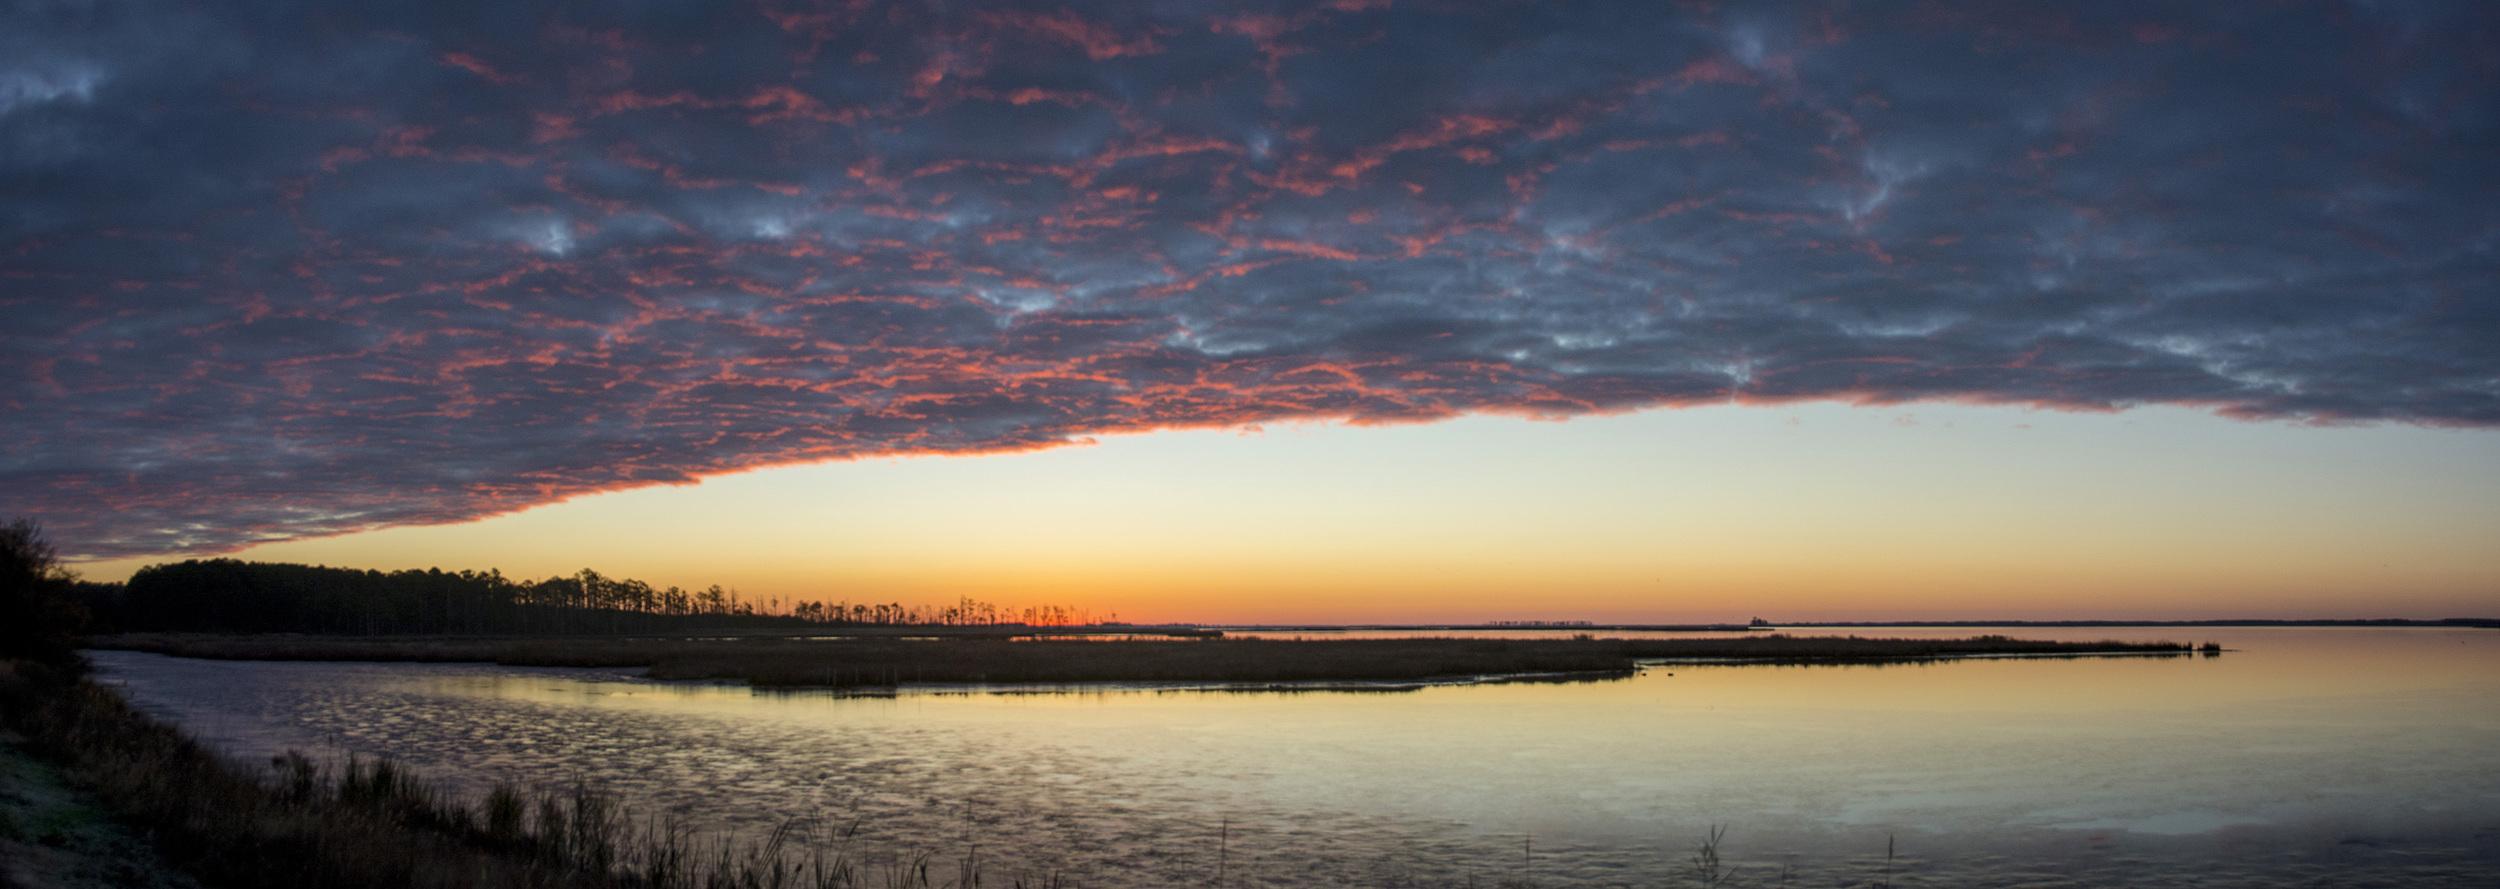 Sunrise Pano in Blackwater NWR